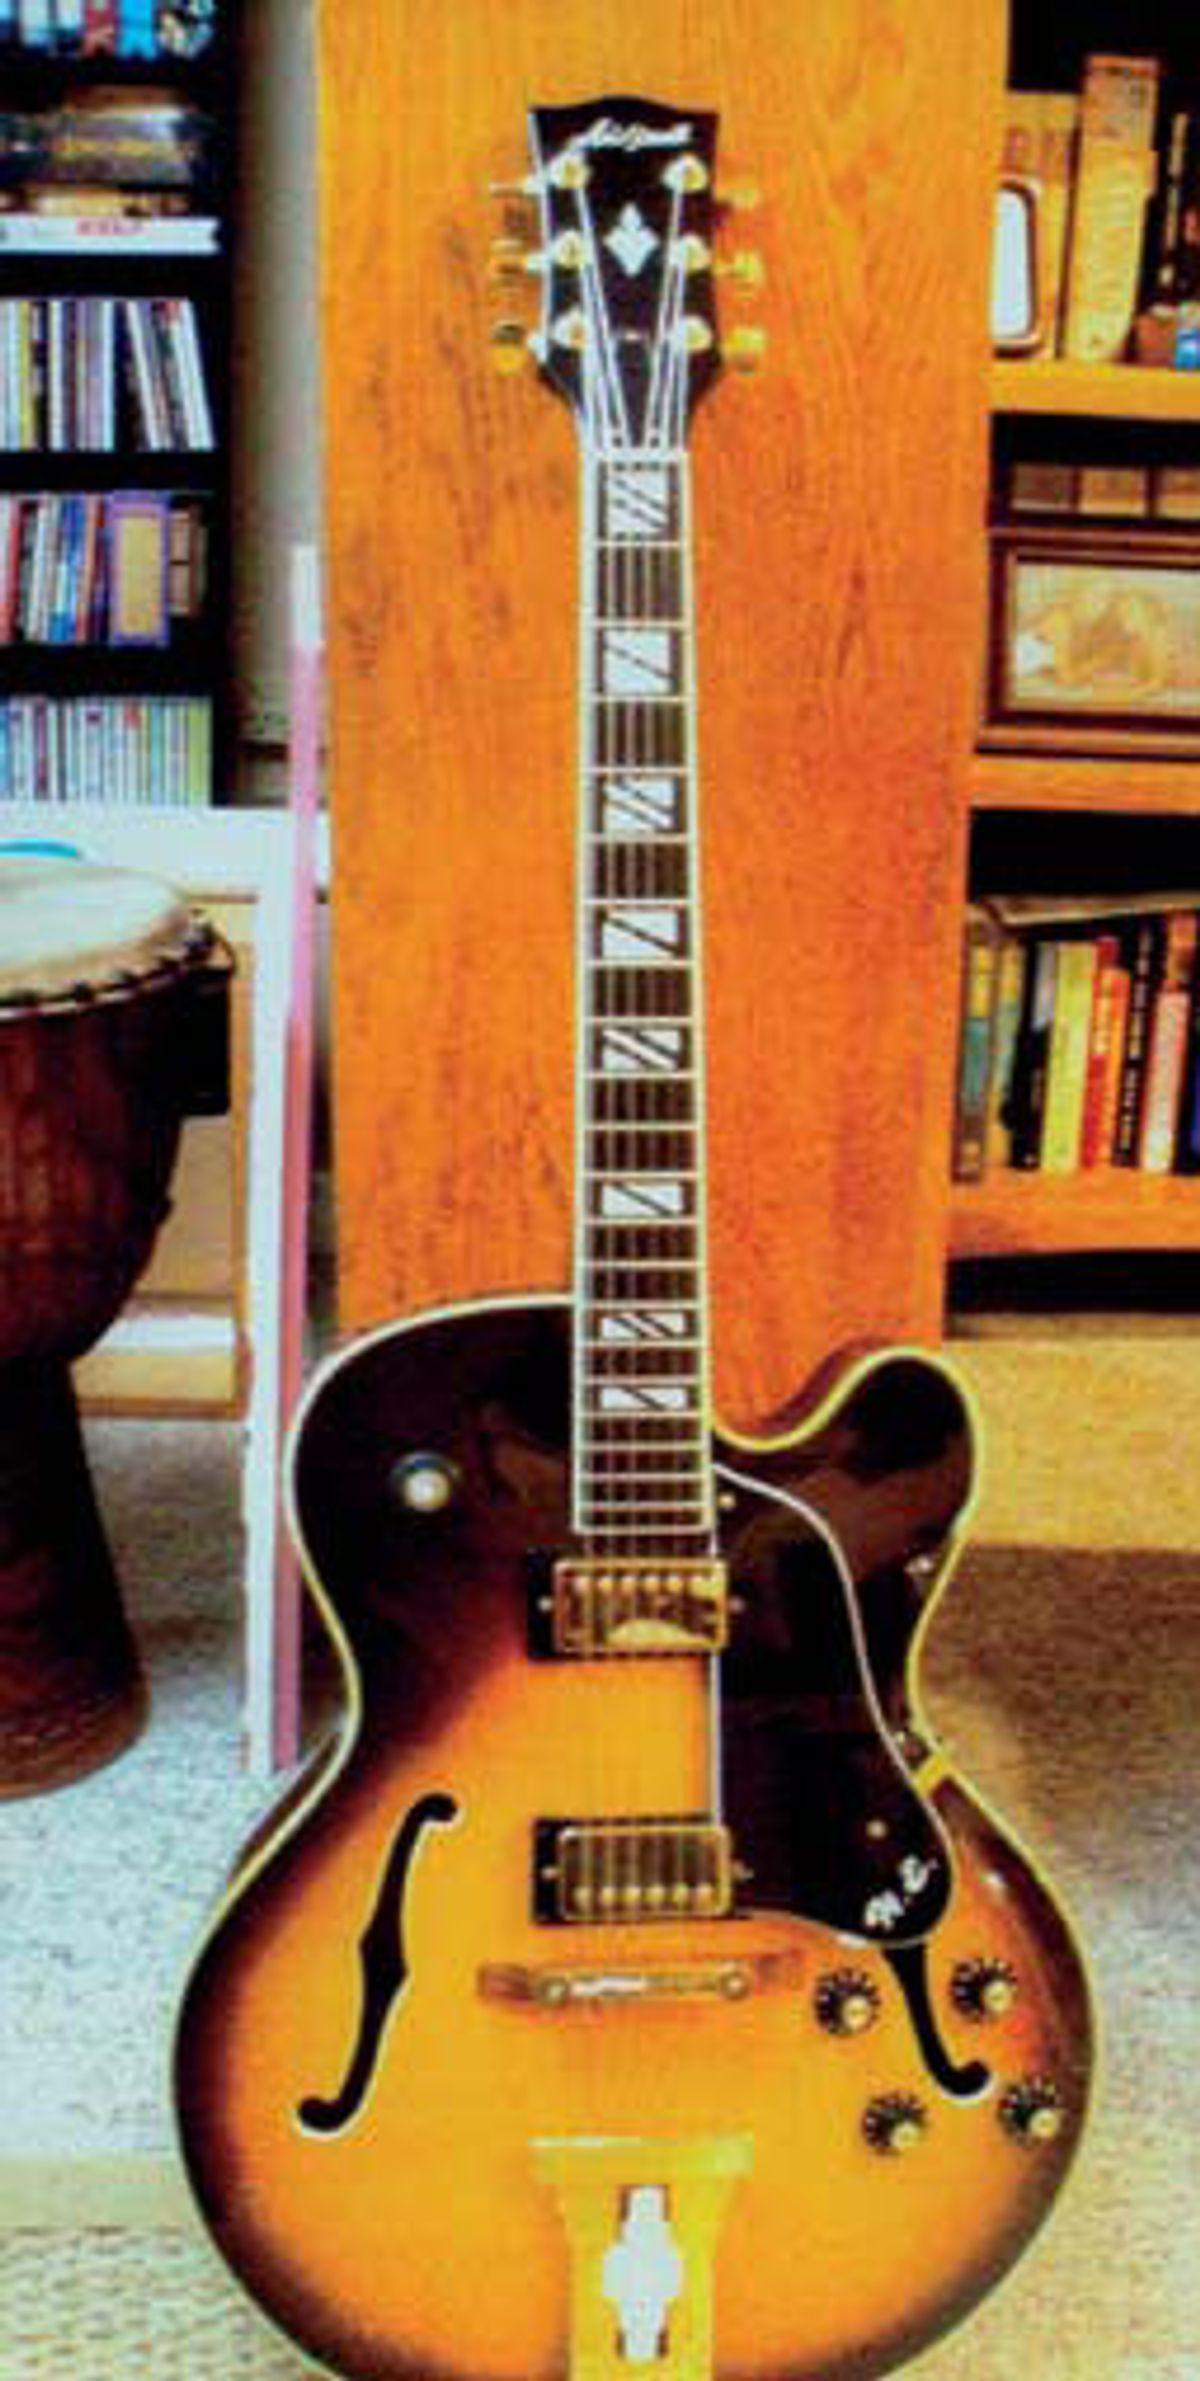 "Aria Pro II ""Herb Ellis"" Model TE 175: Prototype or First Production Model?"